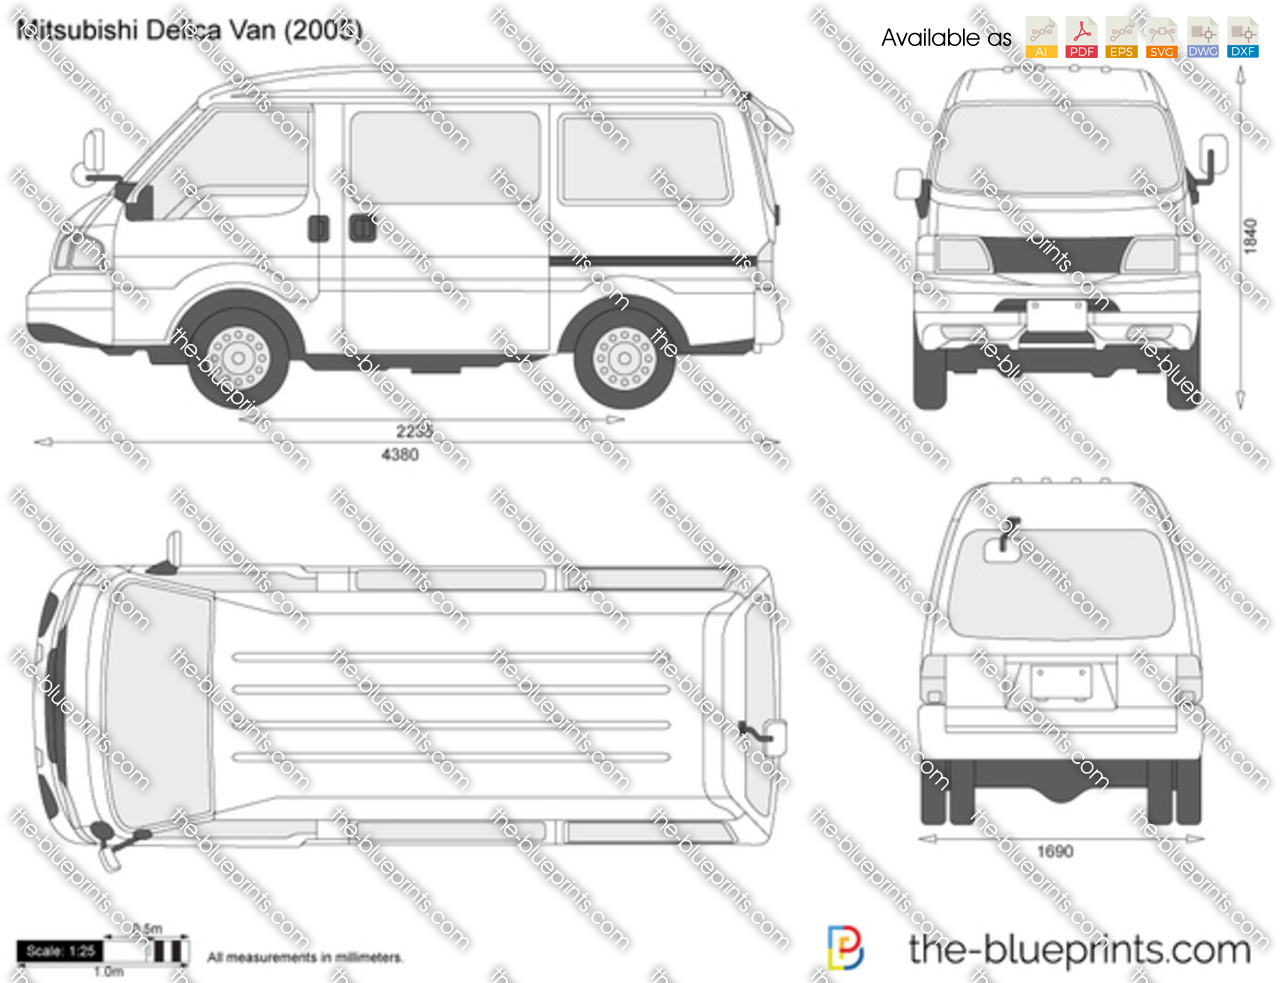 Mitsubishi Delica Van 2016